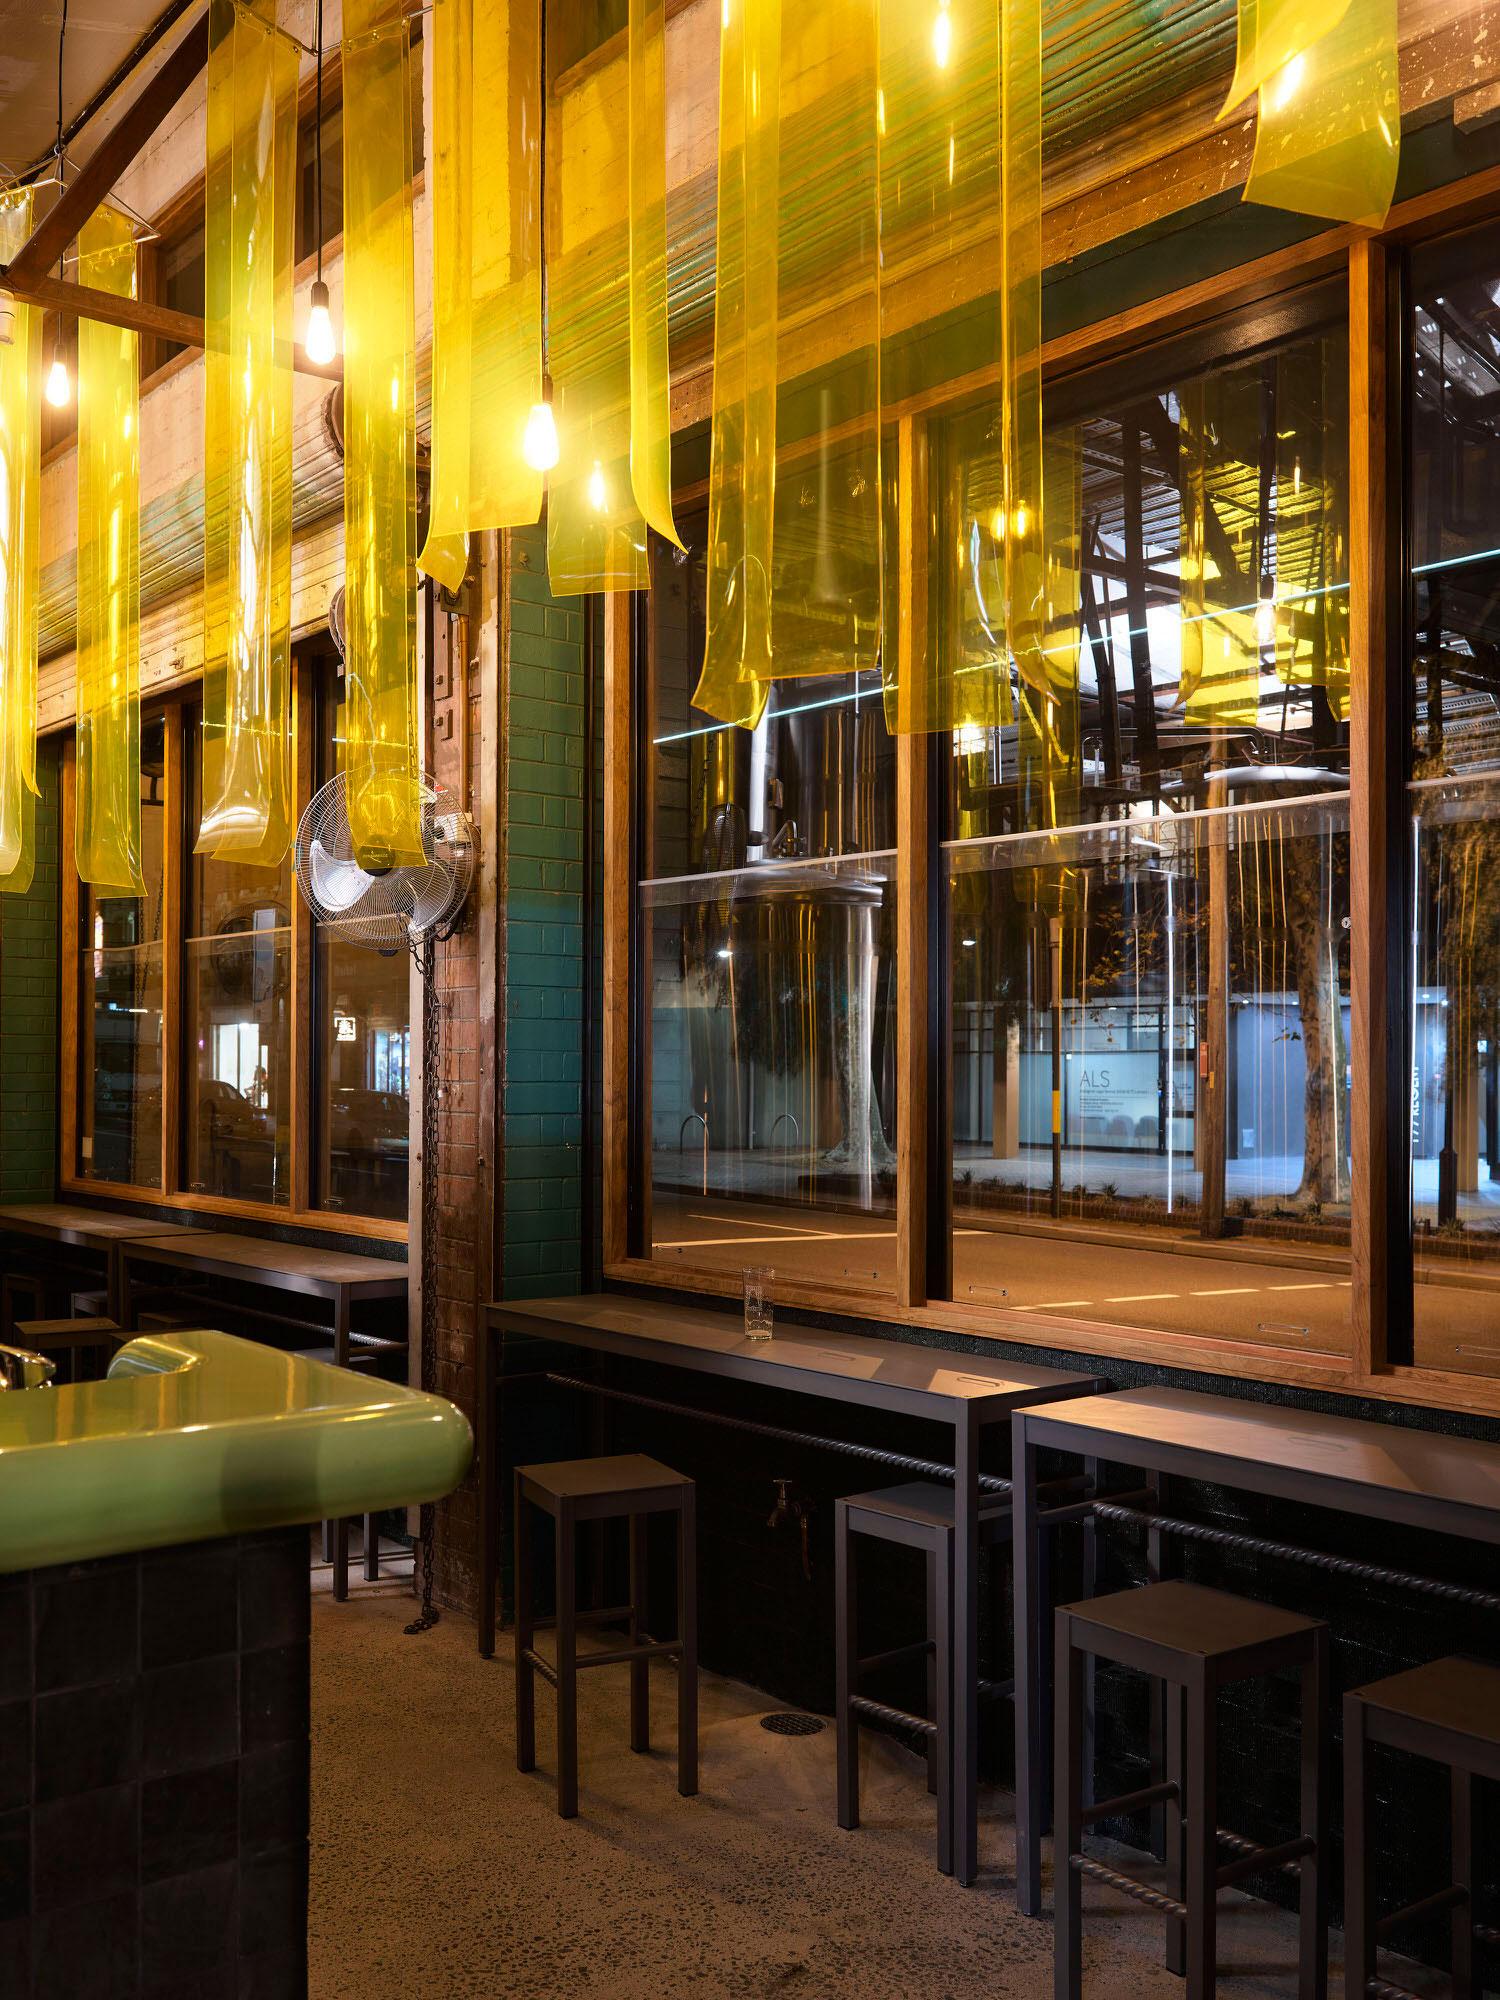 Atomic Beer Project Redfern Ysg Studio Photo Anson Smart Yellowtrace 12